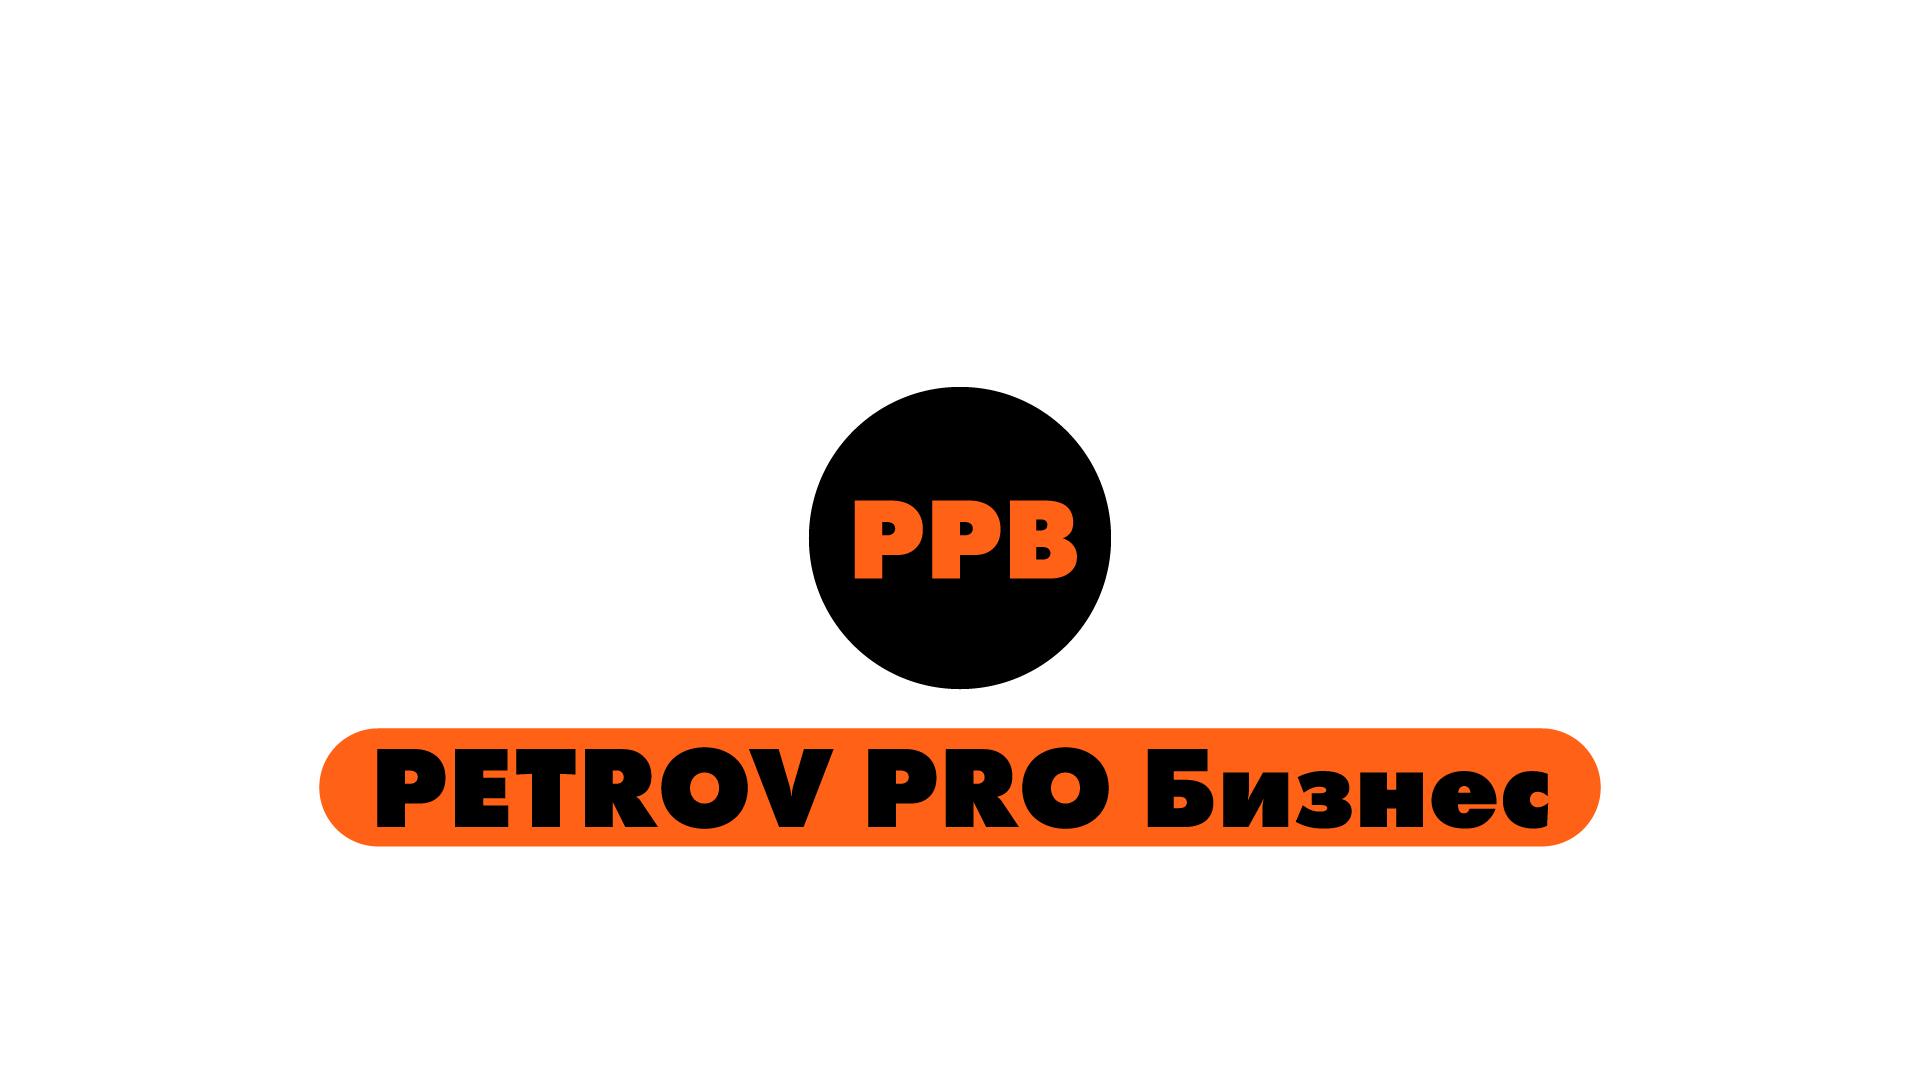 Создать логотип для YouTube канала  фото f_1755bfeea5b0dd4f.png